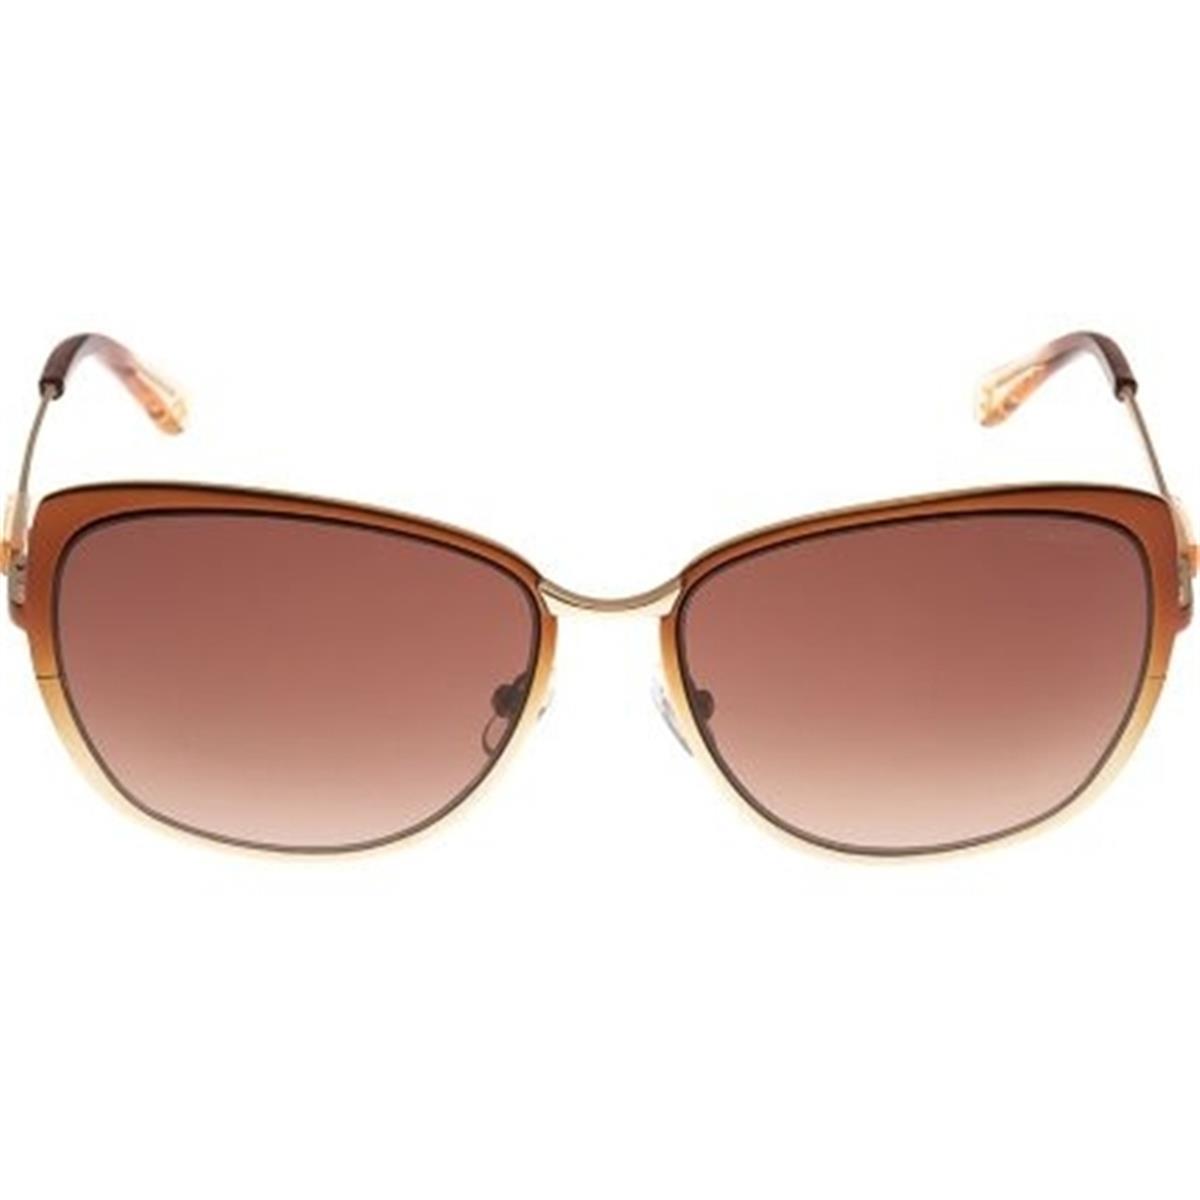 98ed882d2cb68 Óculos de Sol Marrom e Lente Marrom Degradê 5008 Colcci